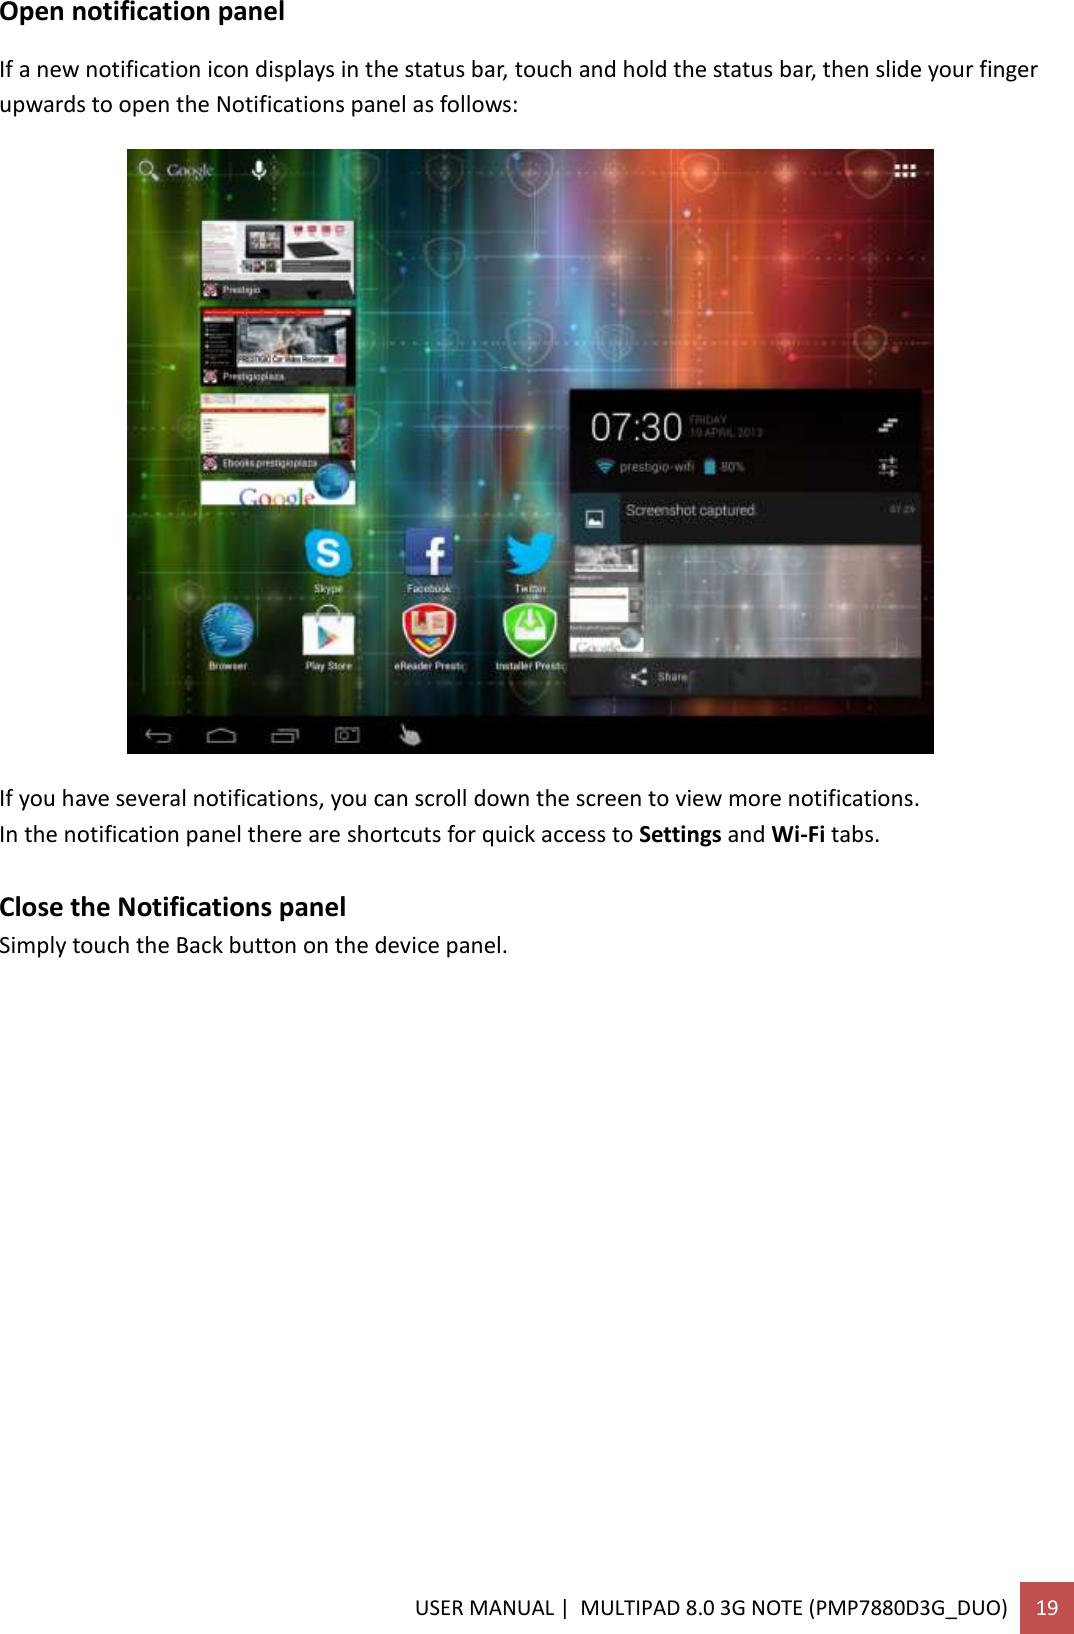 Prestigio Multipad 8 0 3G Note Operating Instructions